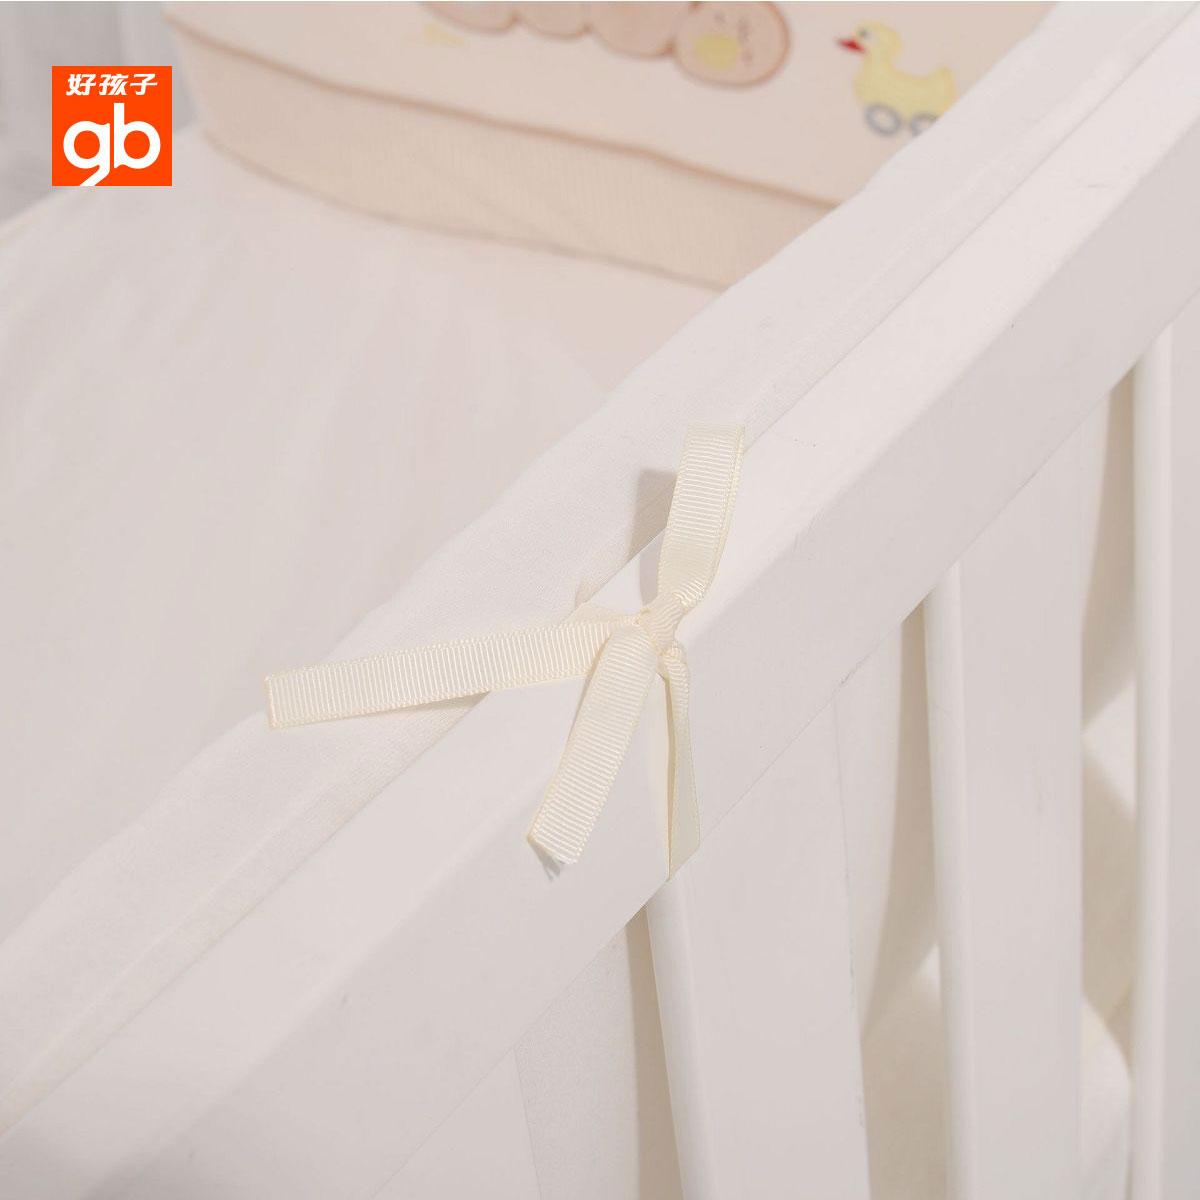 gb良い子の赤ちゃん寝具セット新生児ベッド品ベッドスカートベビーベッドを綿ベッド帷五件套